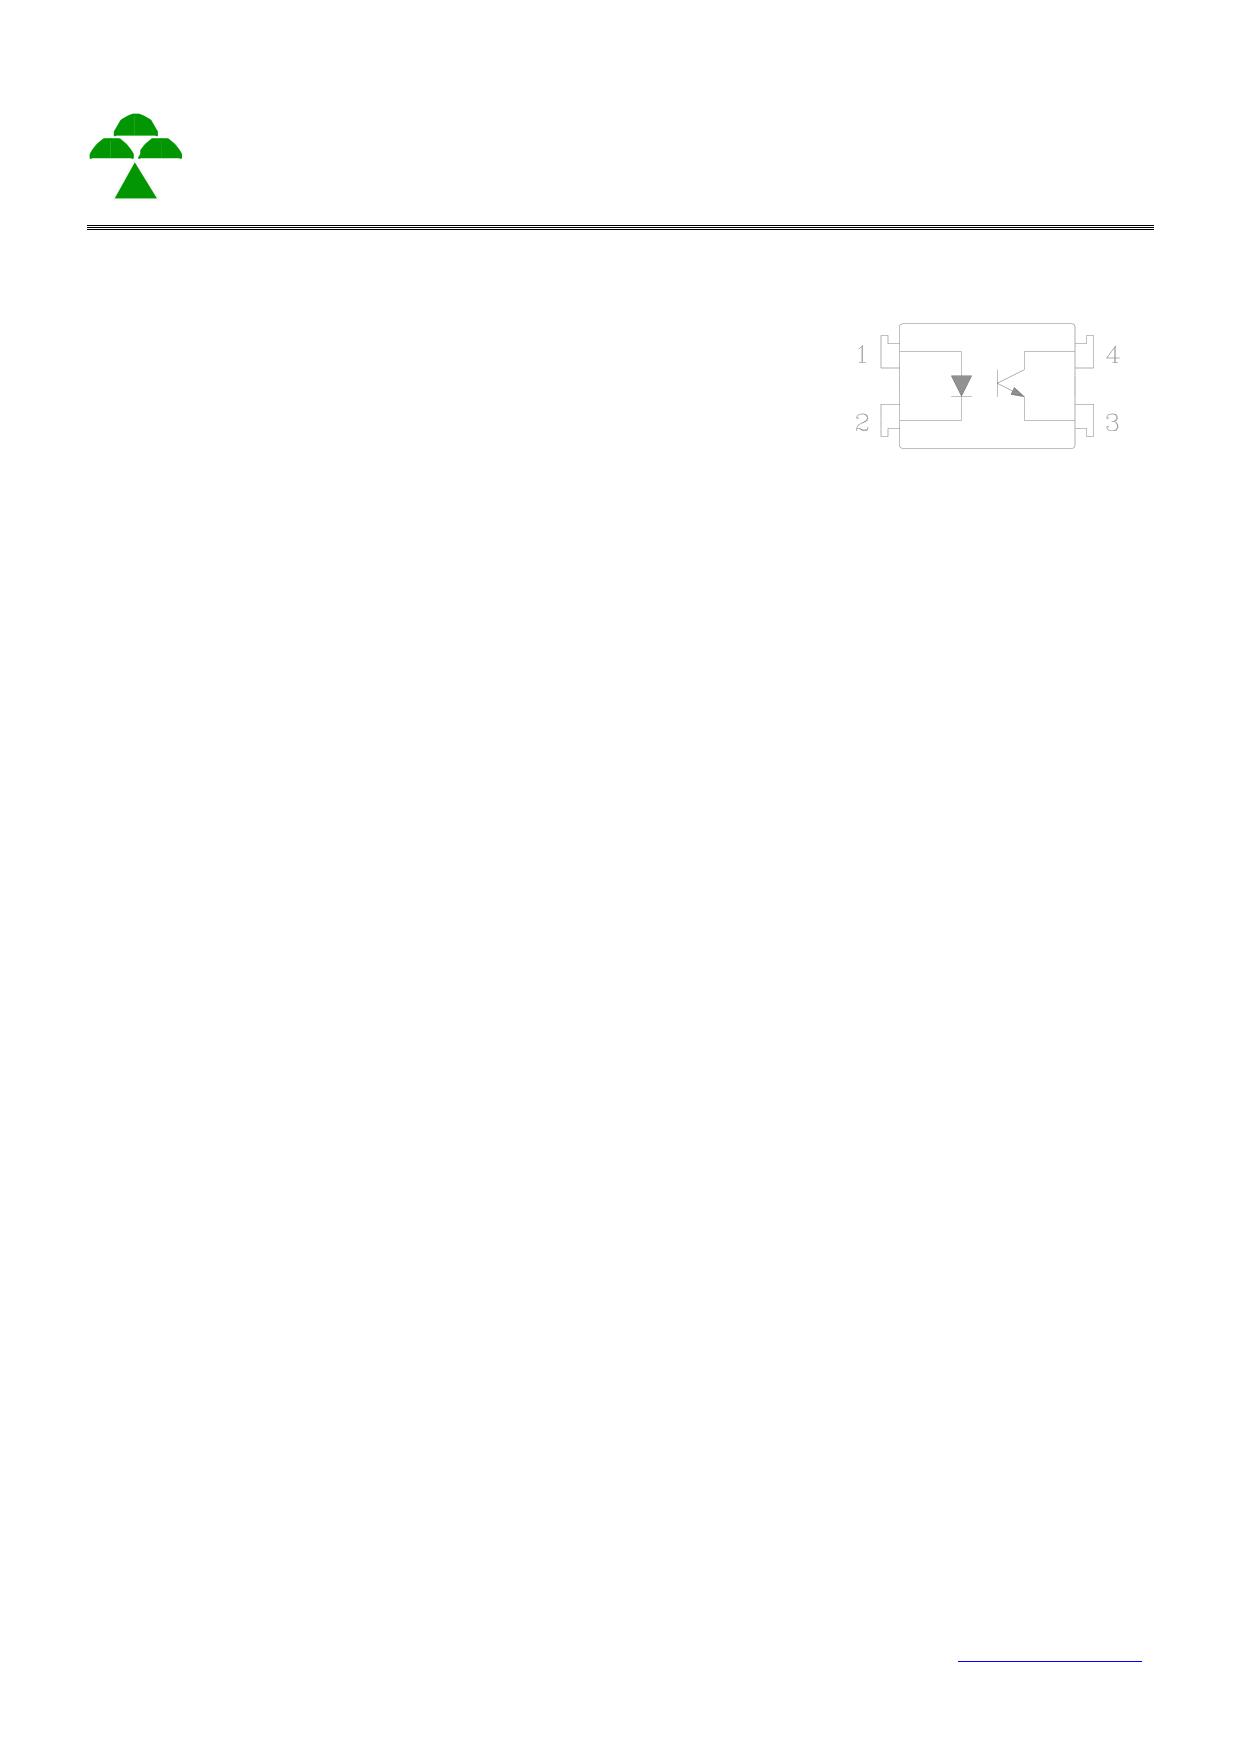 K10104W datasheet